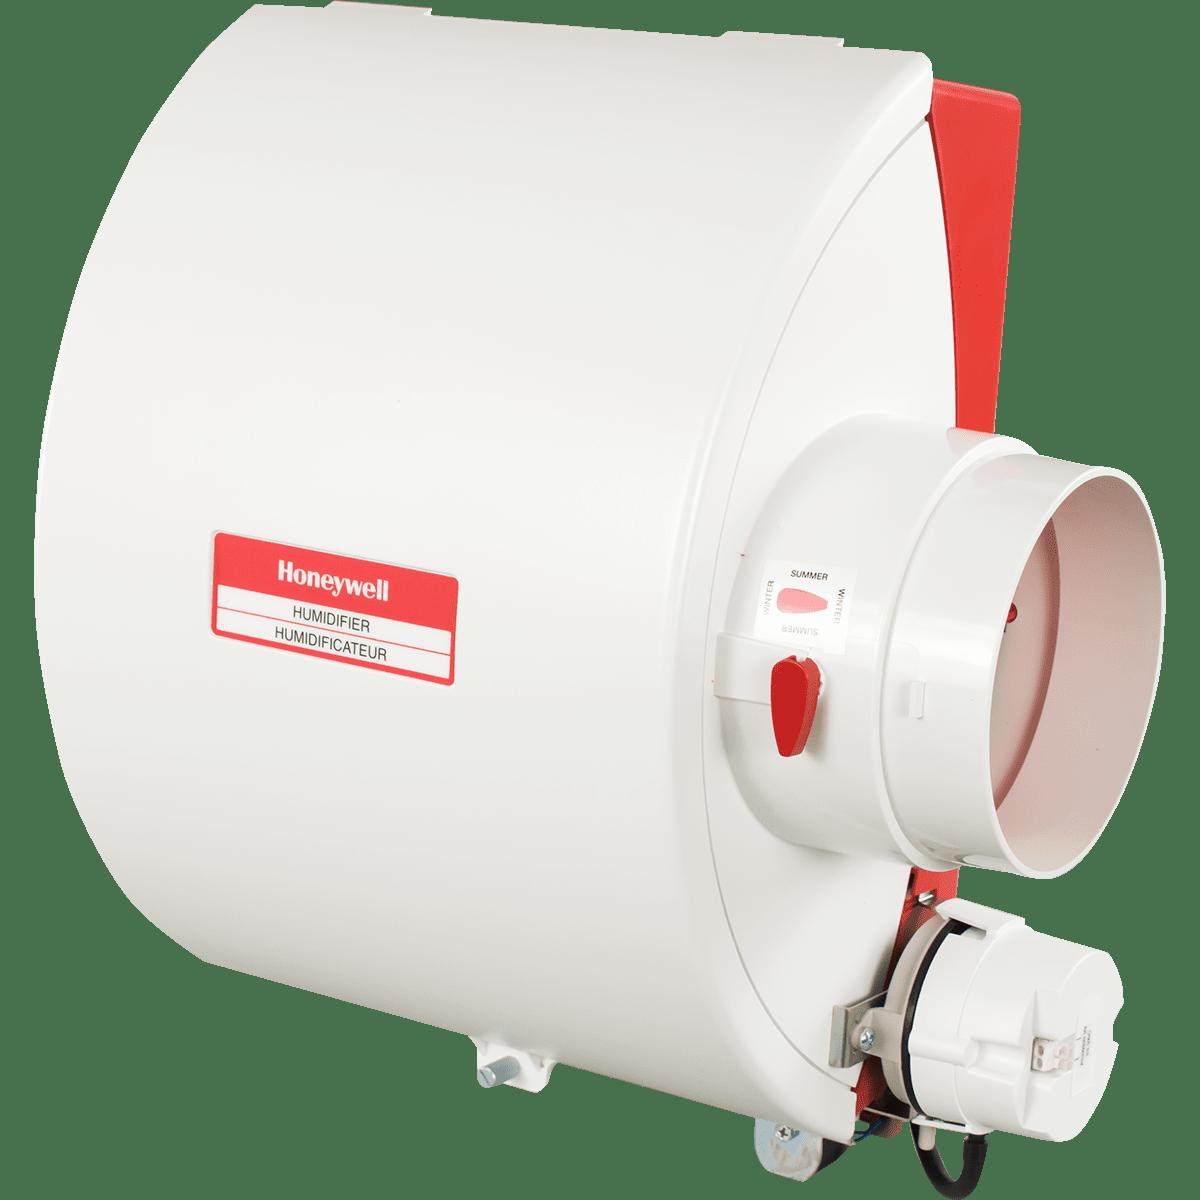 HE280 Whole House Bypass Humidifier Free Shipping Sylvane #A02E2B